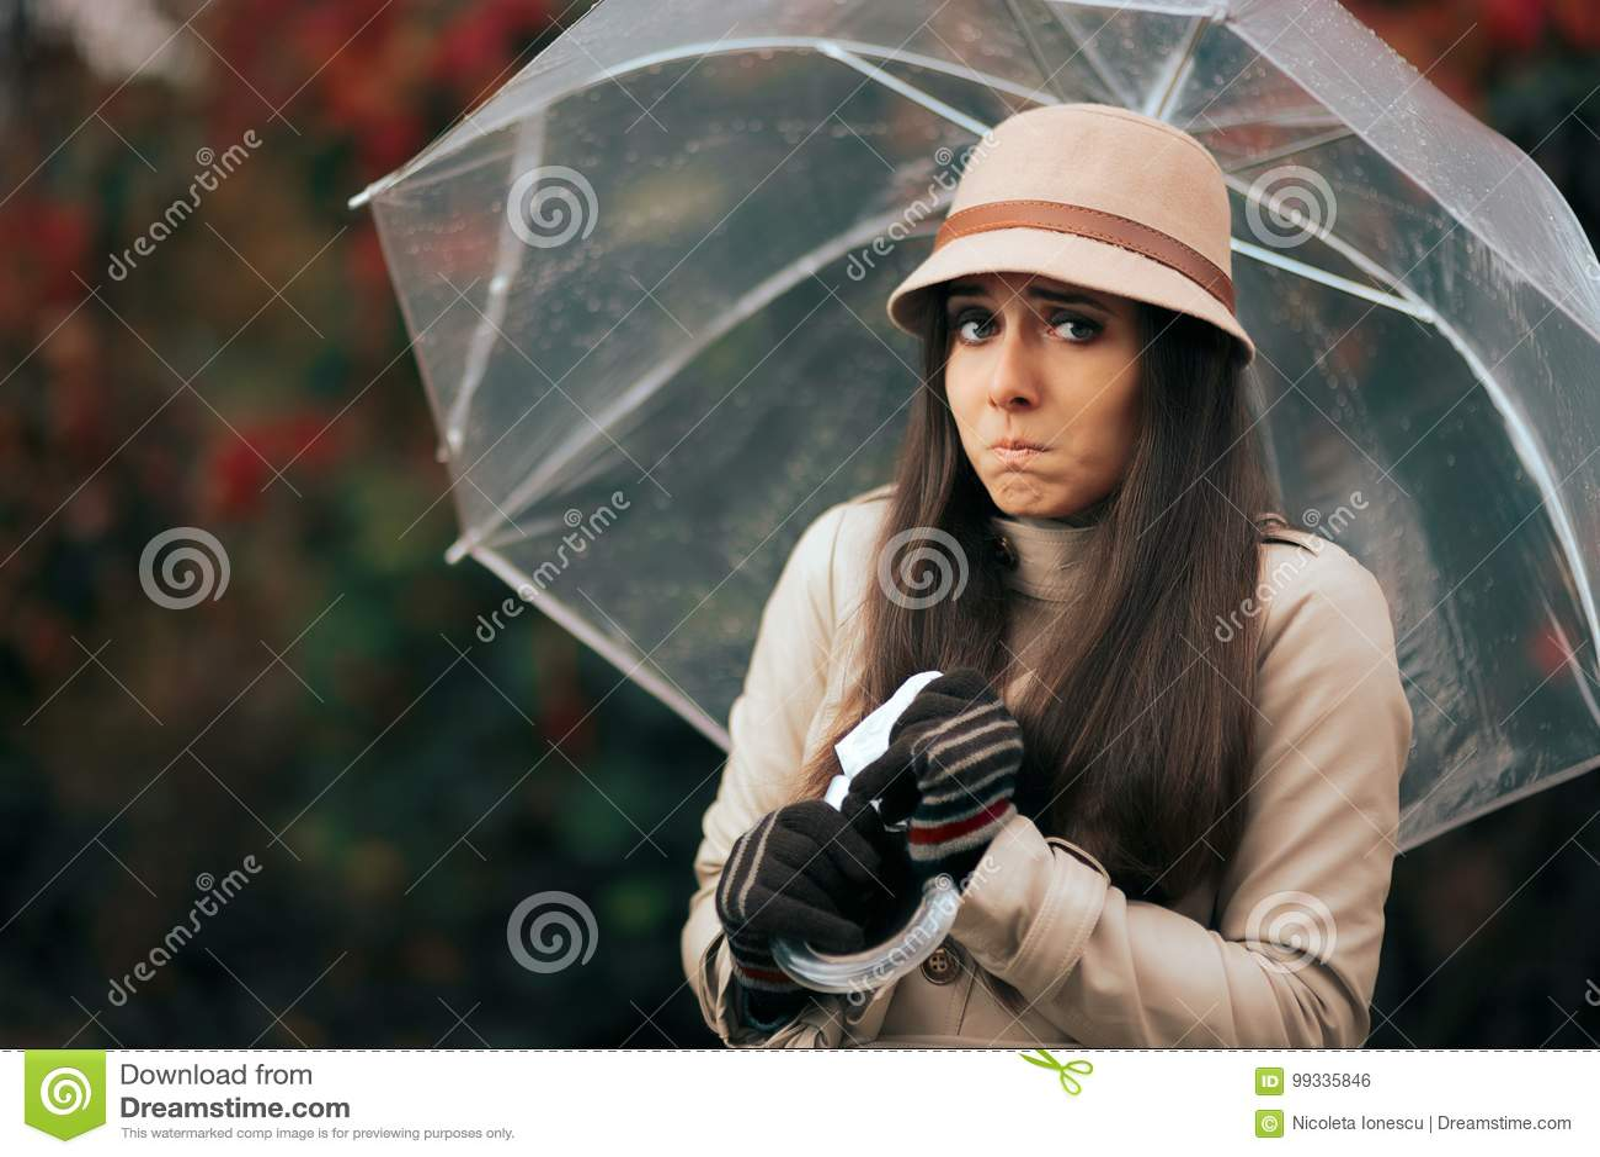 sick-woman-holding-umbrella-autumn-rain-